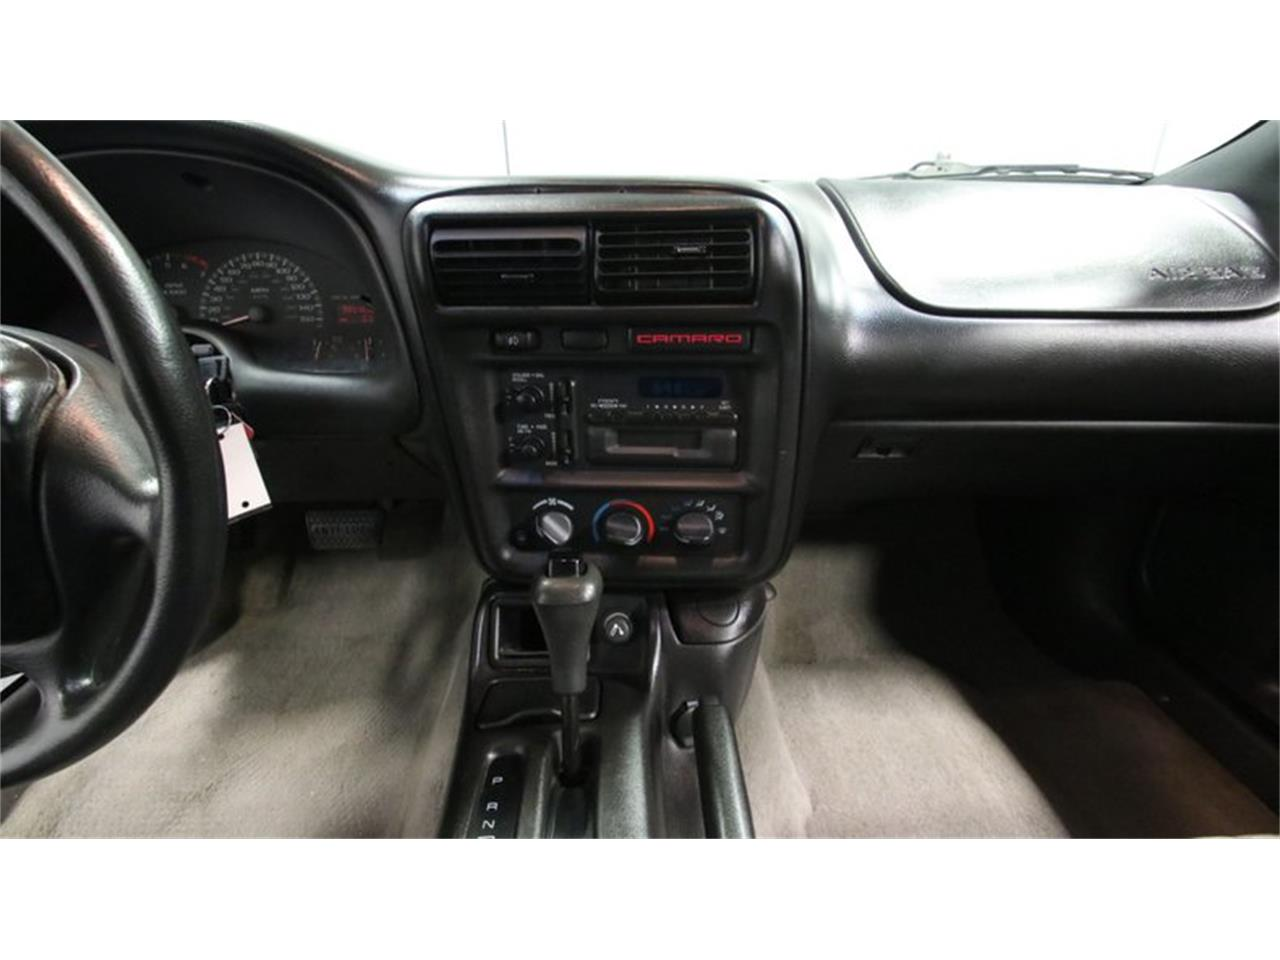 2001 Chevrolet Camaro (CC-1413639) for sale in Lithia Springs, Georgia